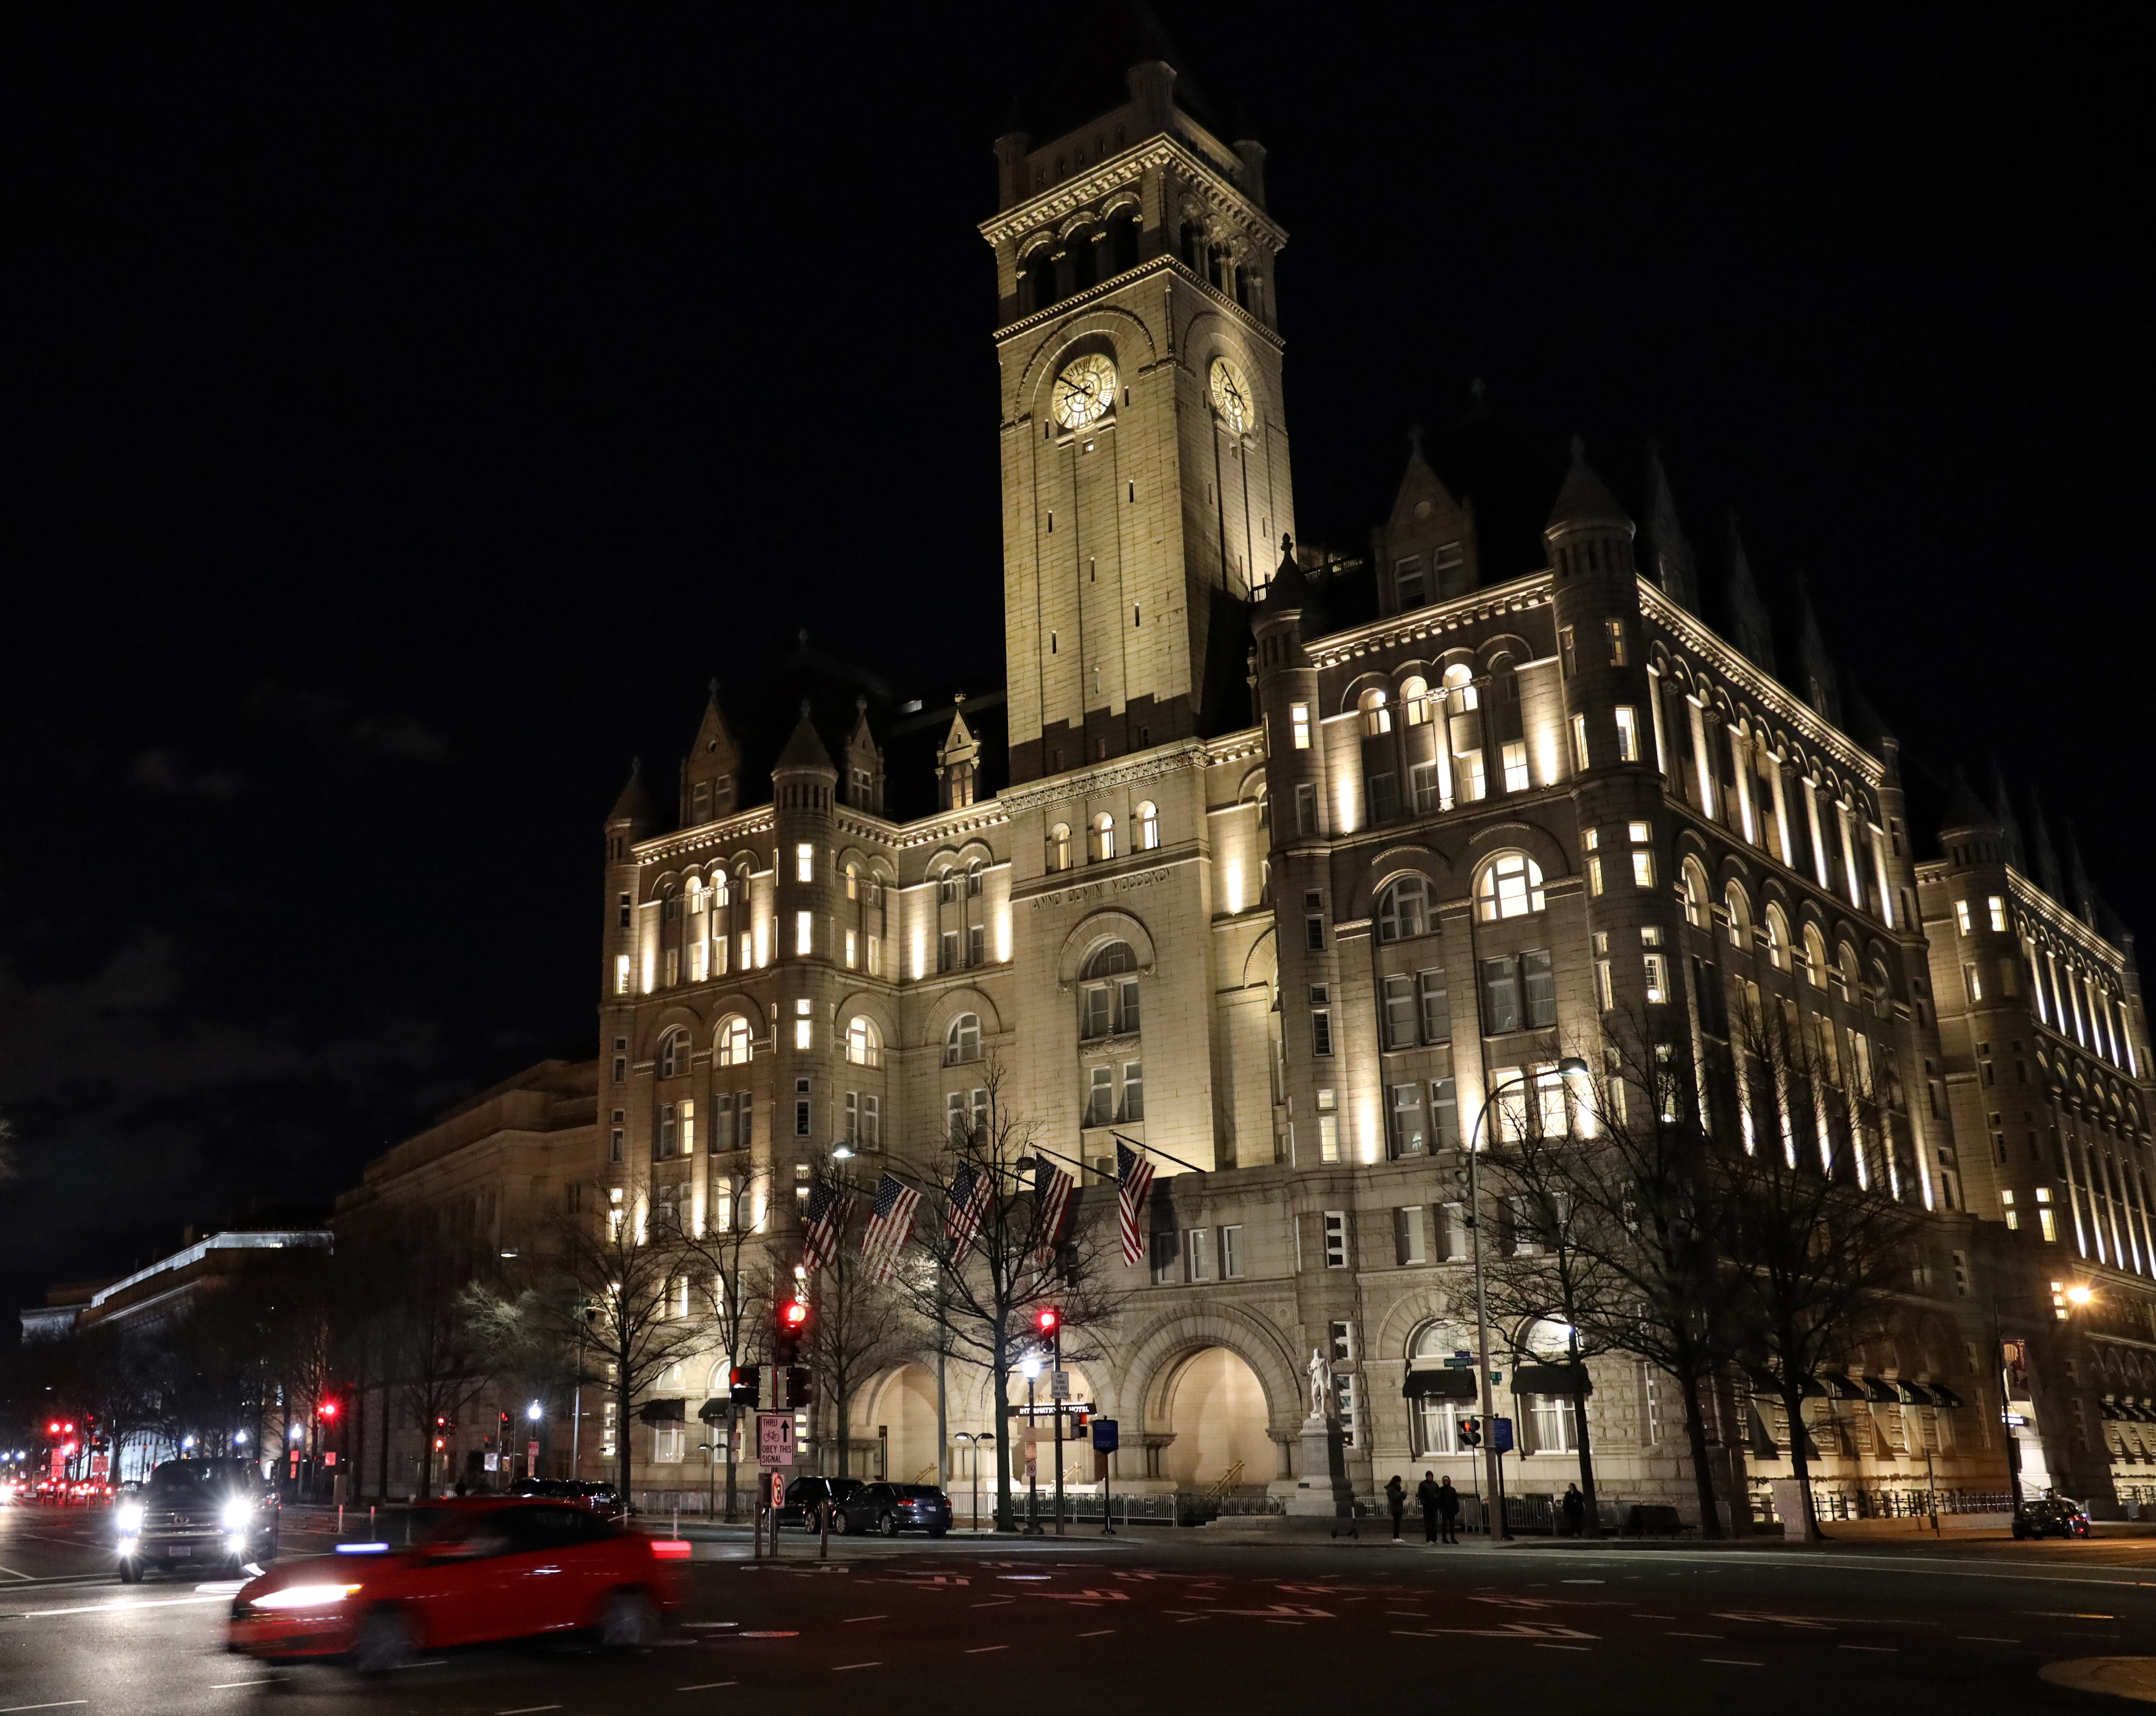 The Trump International Hotel in Washington, D.C. as seen on March 22, 2019. (Alex Wroblewski/Getty Images)